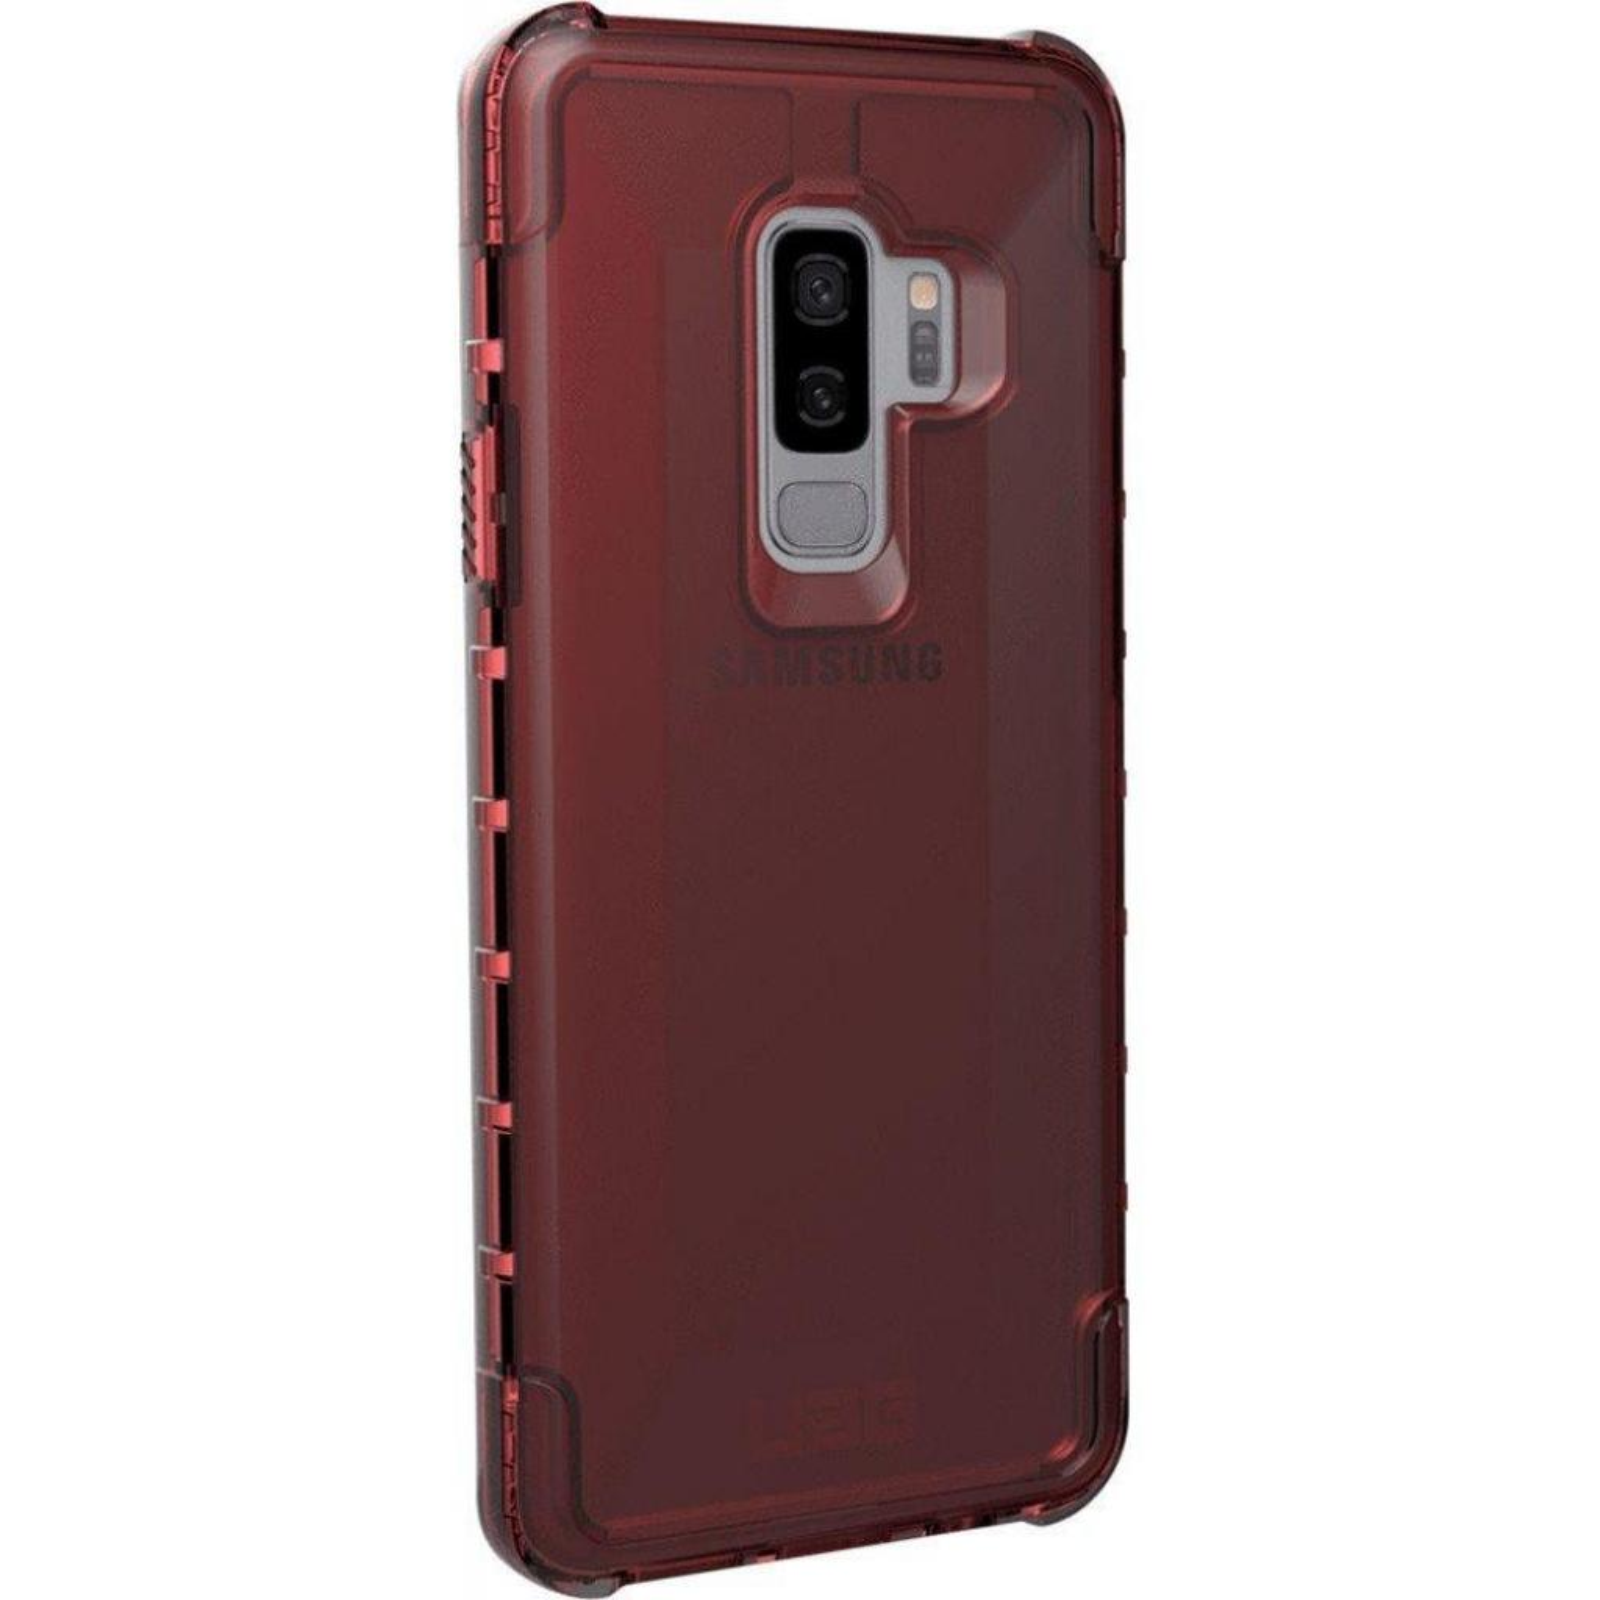 Чехол для моб. телефона Urban Armor Gear Galaxy S9+ PlyoCrimson (GLXS9PLS-Y-CR) изображение 3